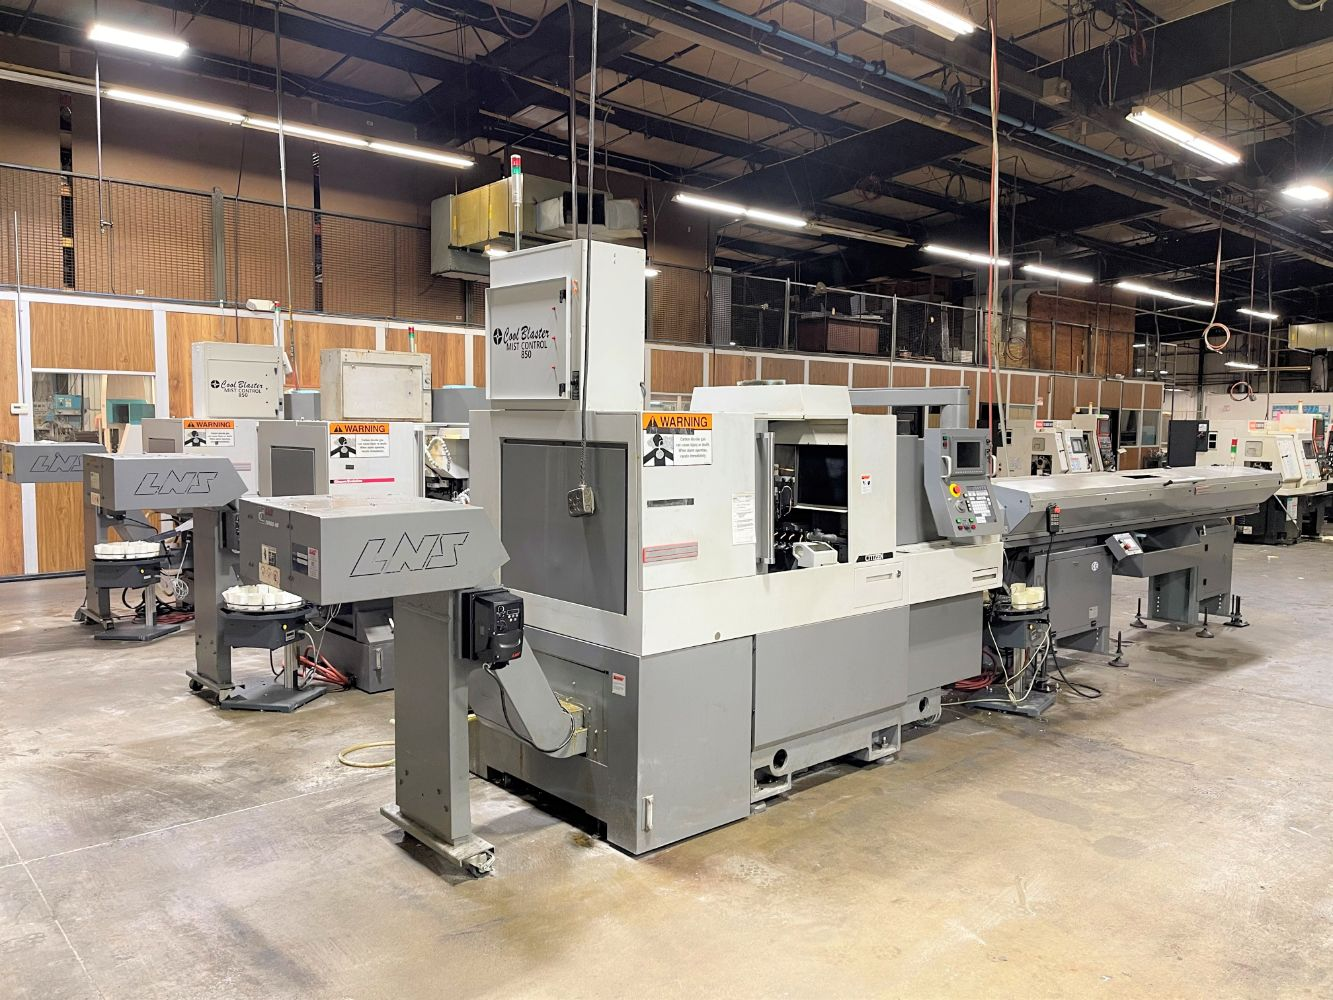 Precision CNC Machining Facility Closure - Tier 1 Caterpillar Supplier